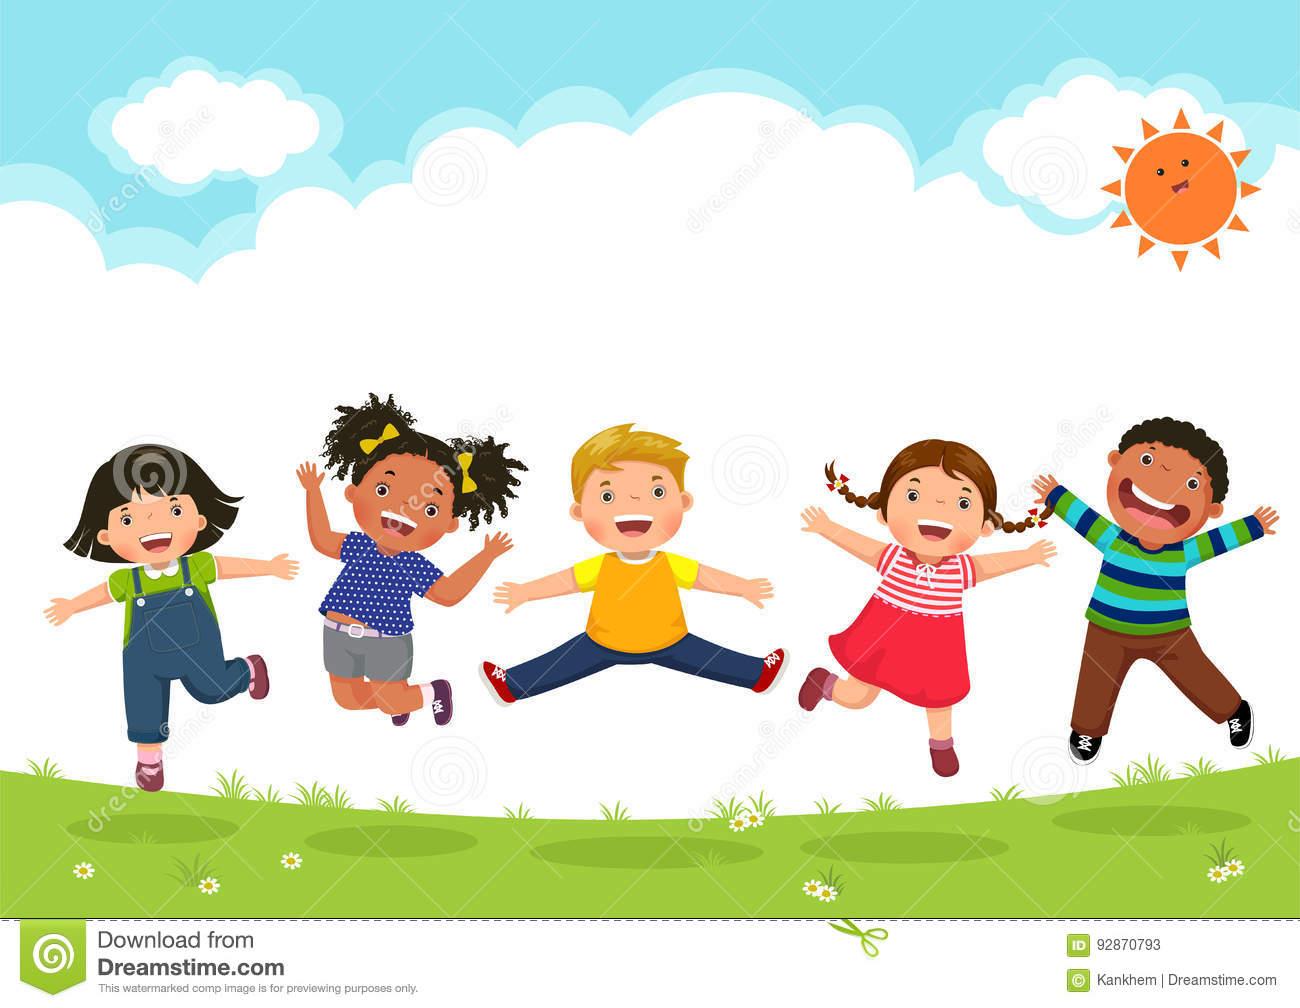 Sunny Stock Illustrations u2013 128,253 Sunny Stock Illustrations, Vectors u0026  Clipart - Dreamstime